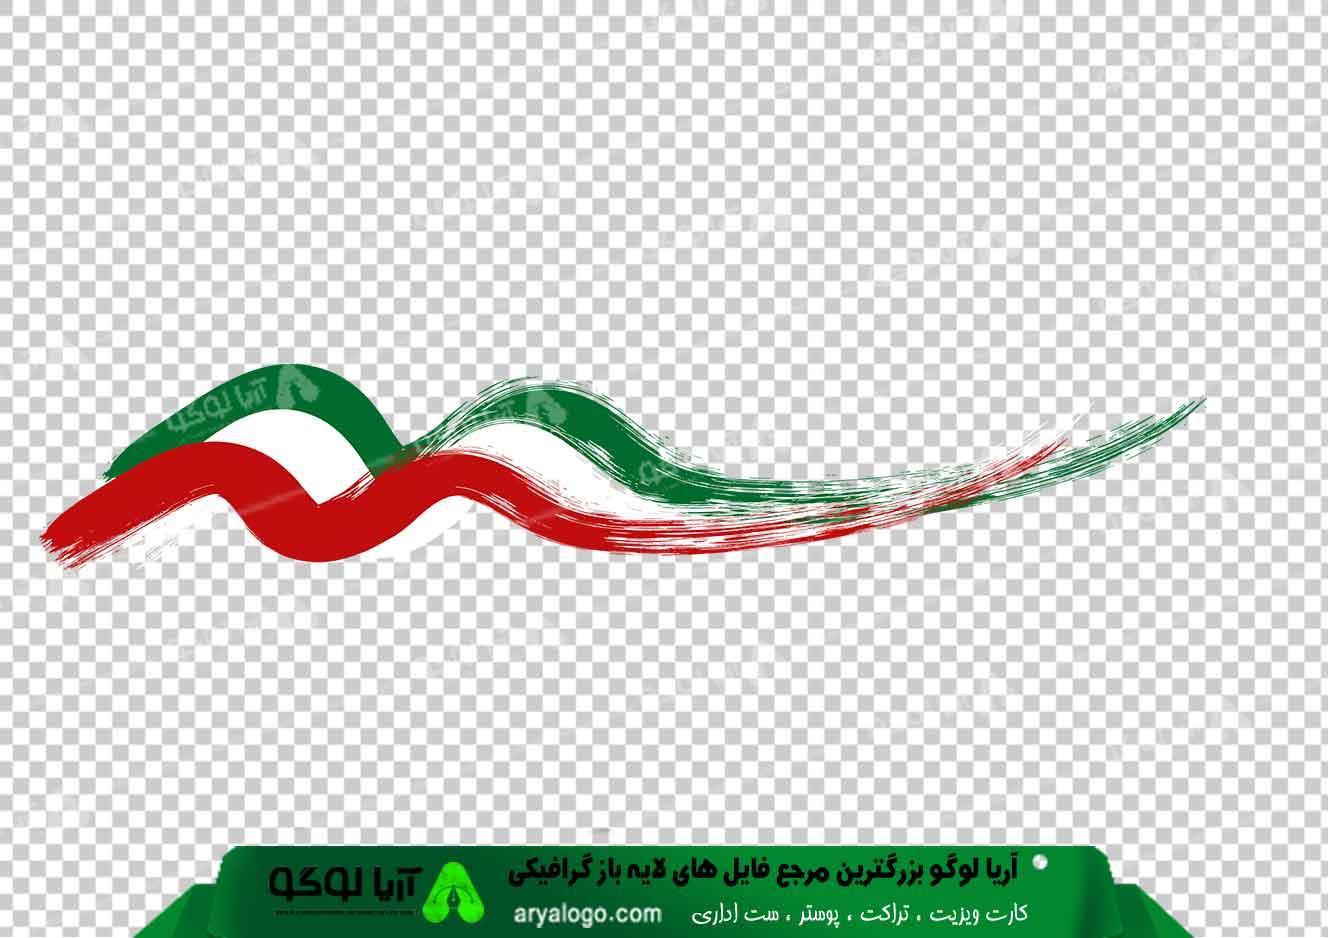 وکتور png پرچم ایران 8